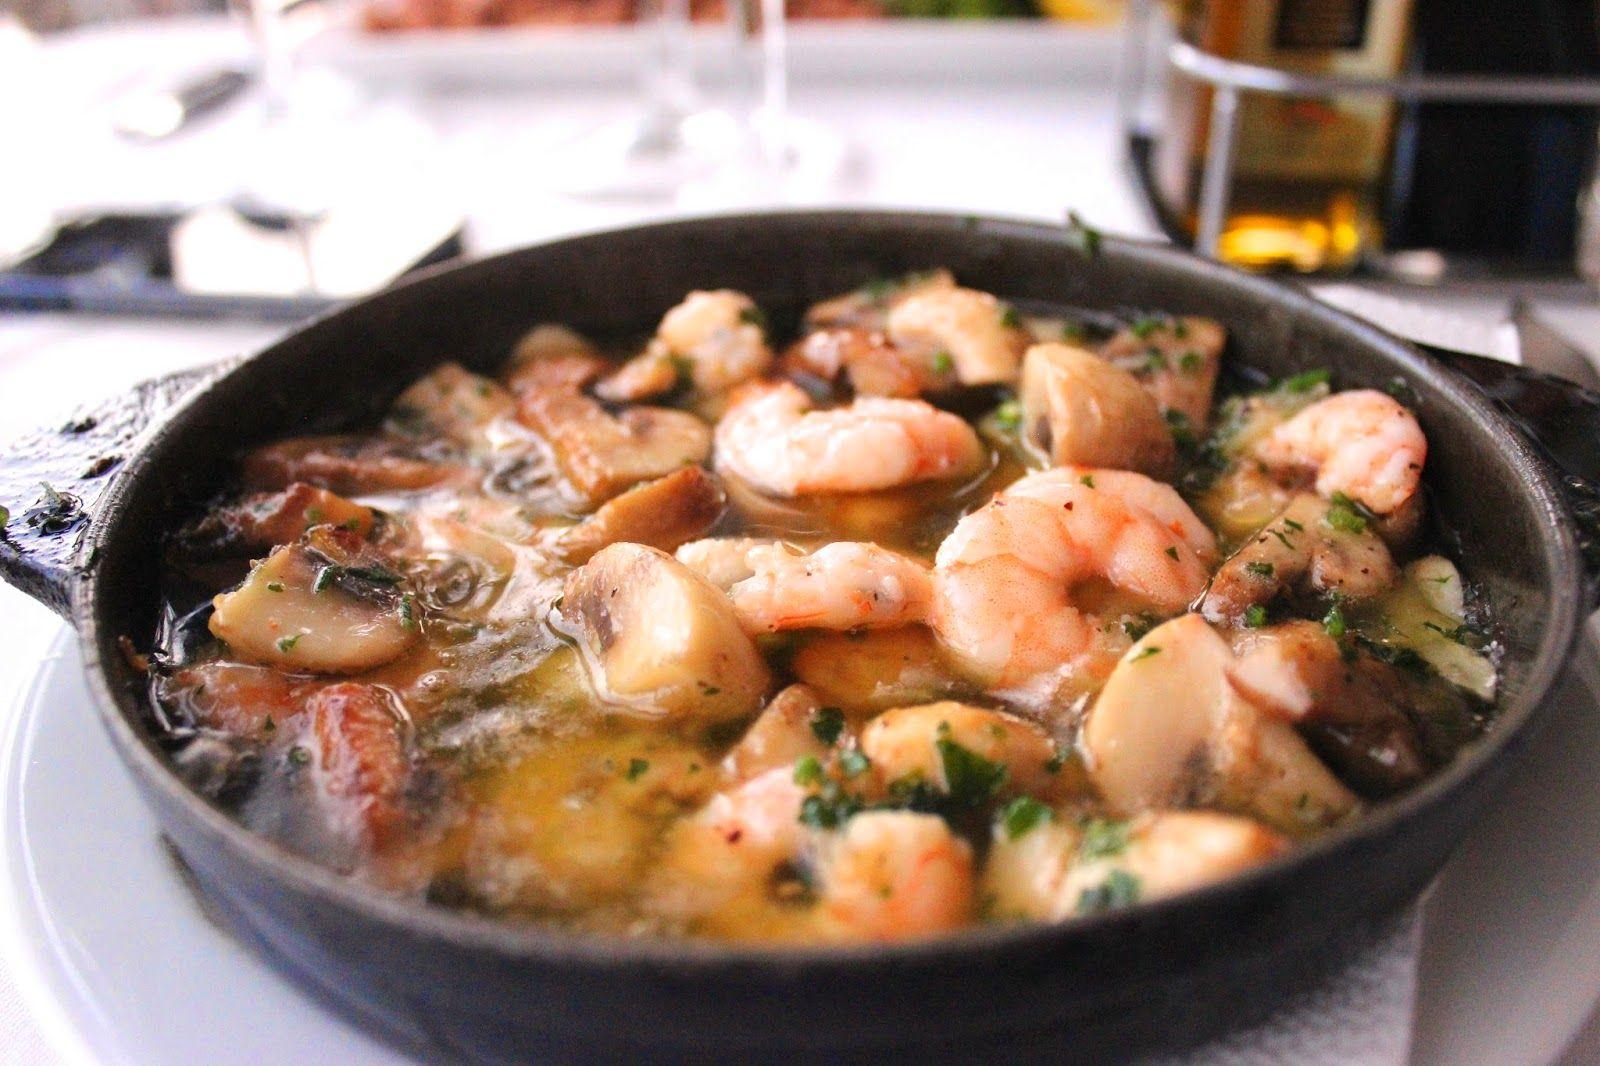 Freshly caught prawns and mushroom in a sizzling garlic oil.